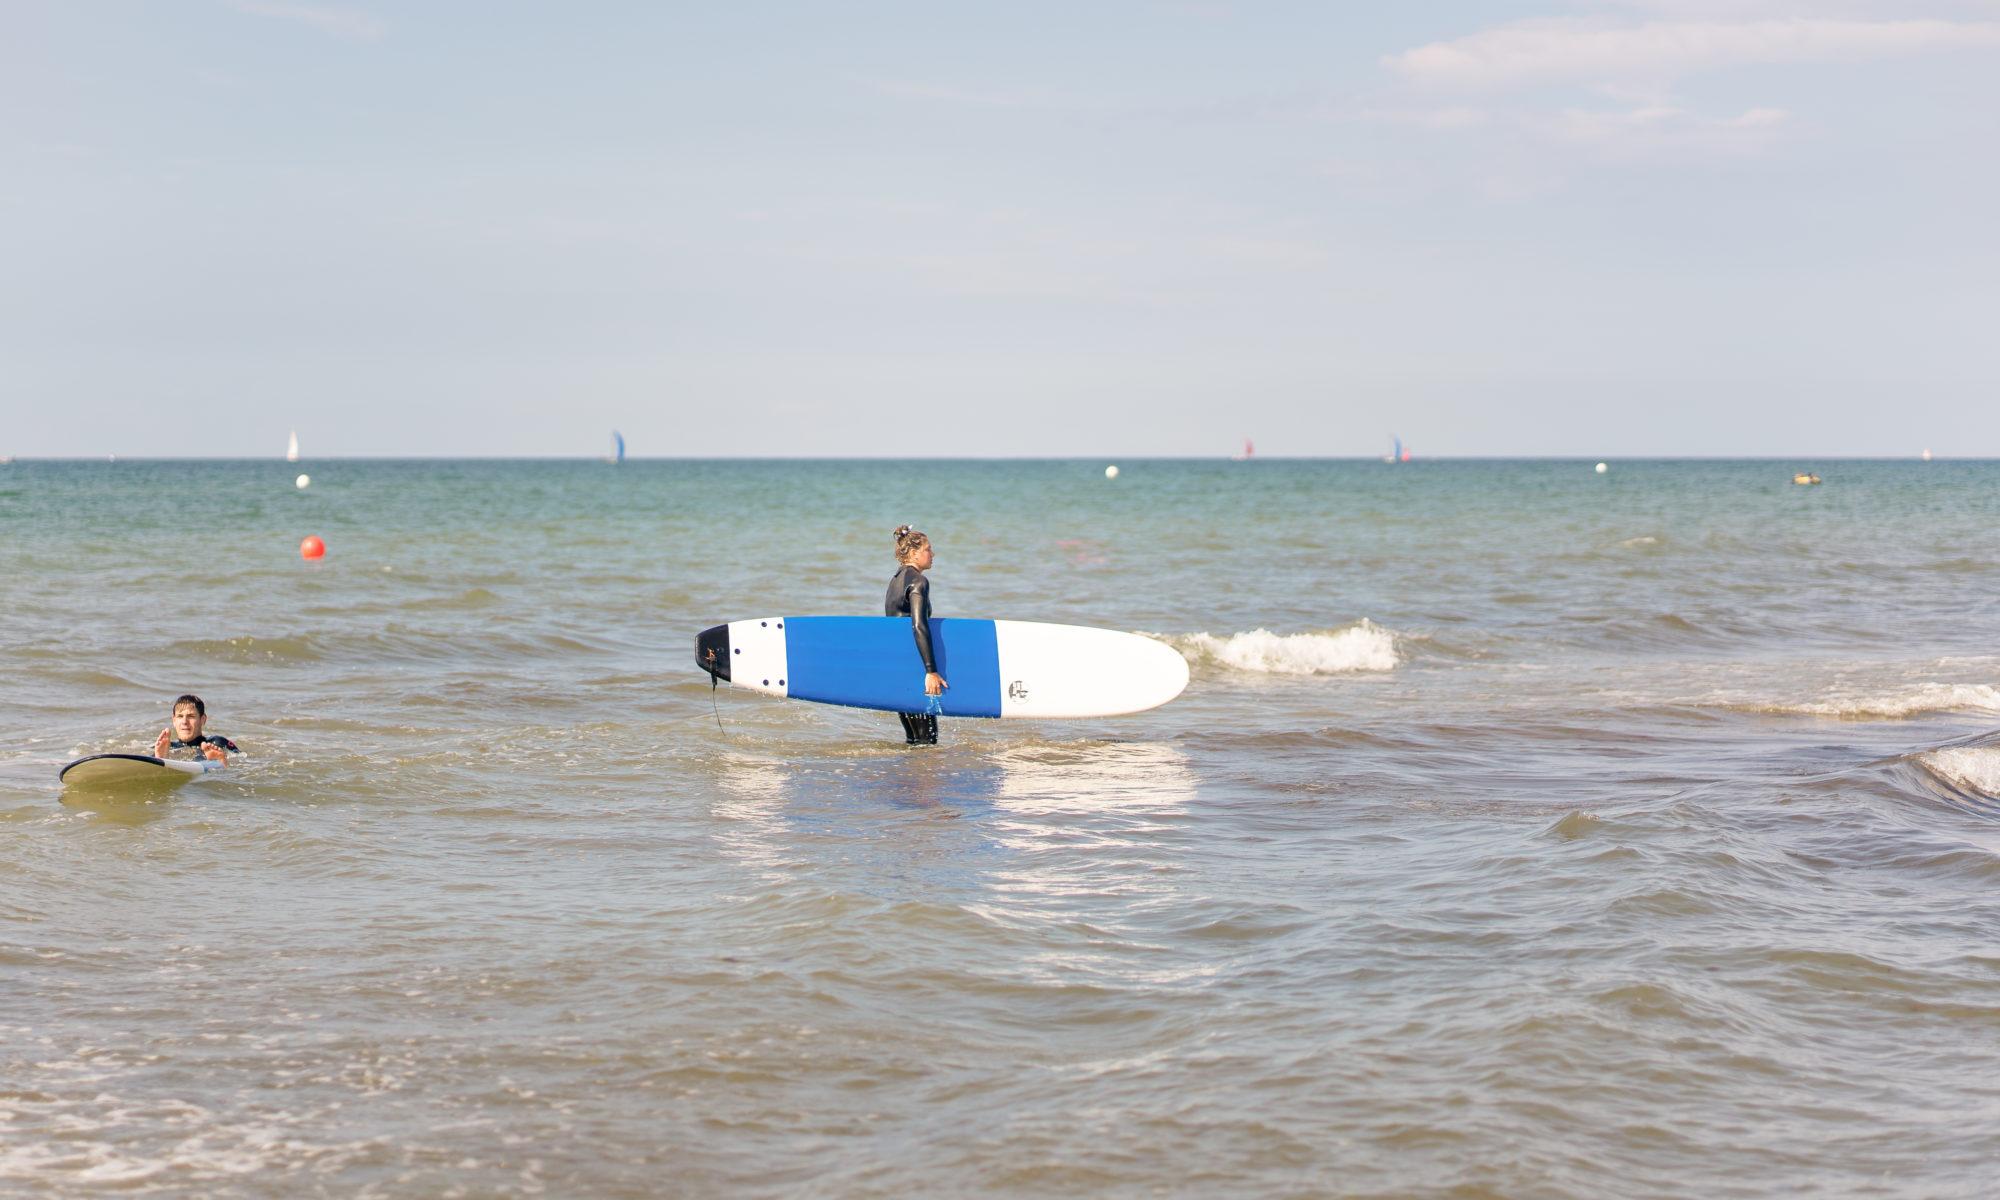 Surfbrett unterm Arm